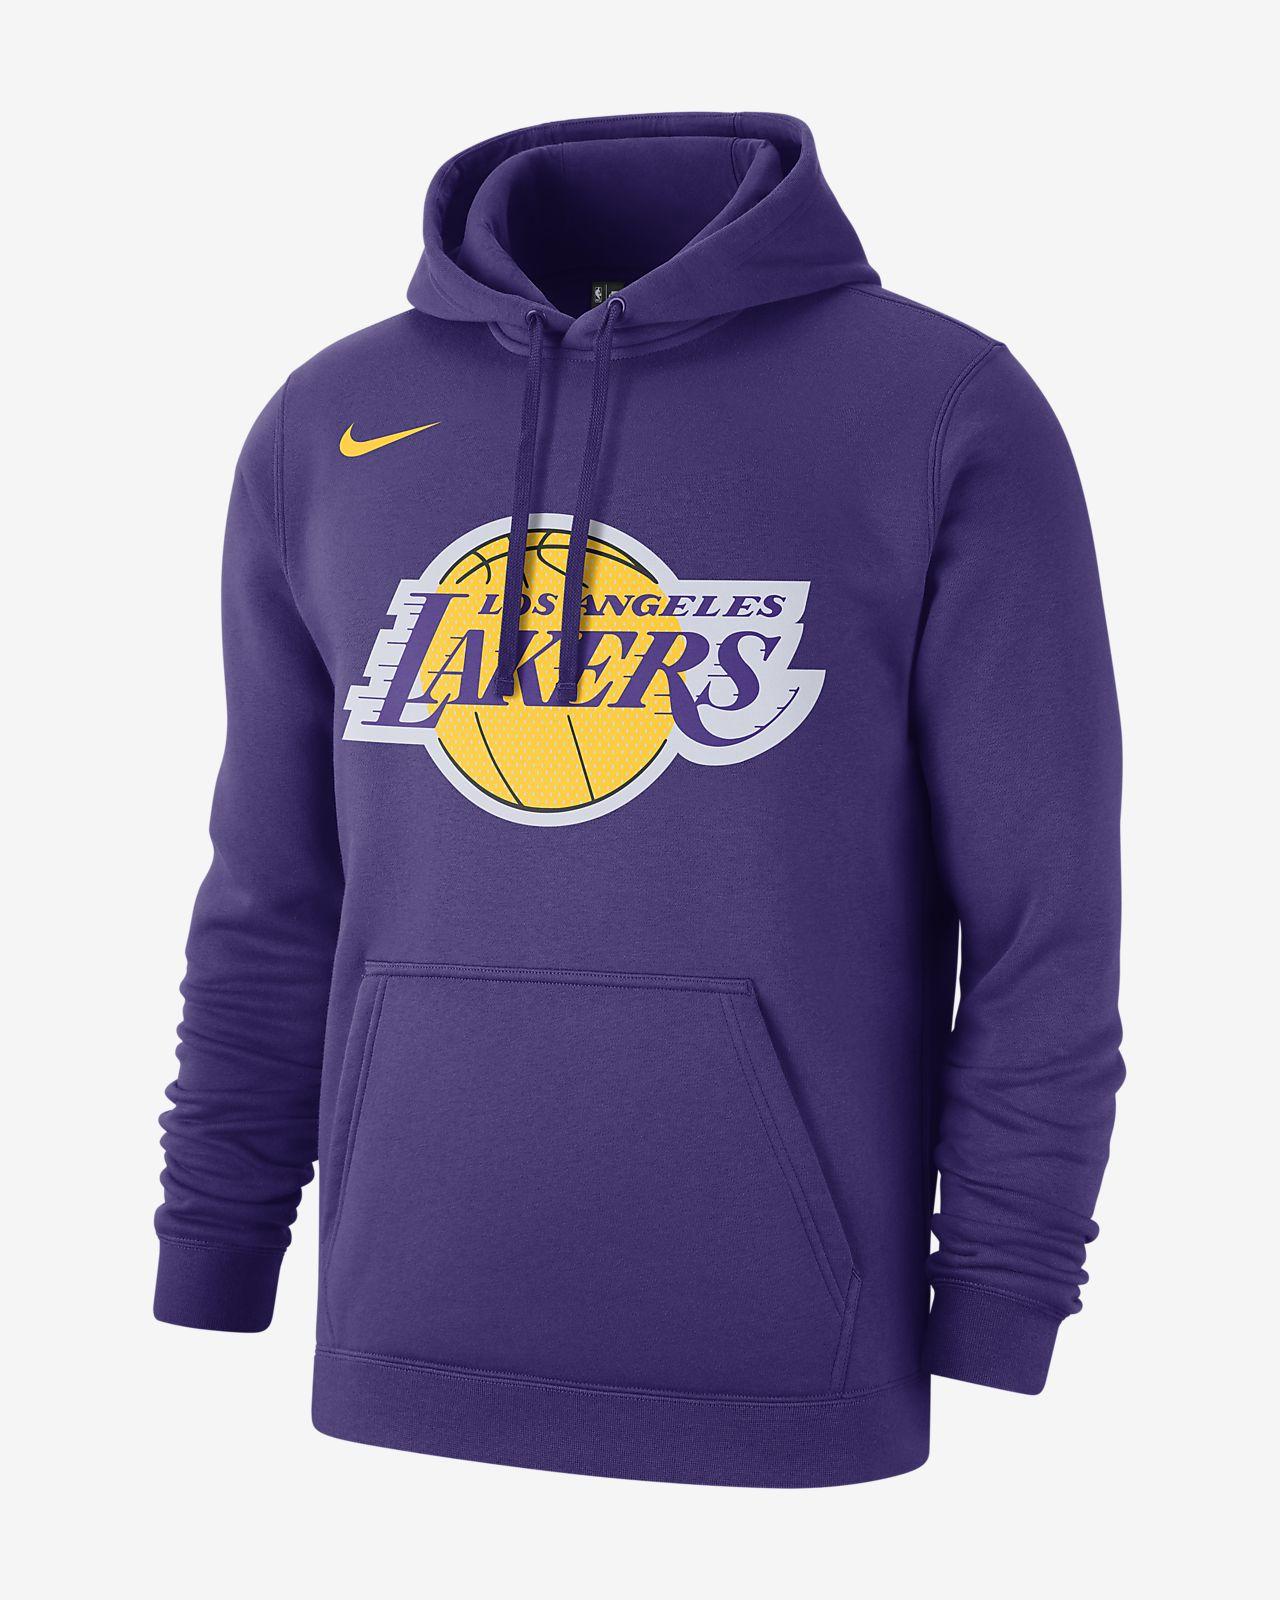 Homme Nike Capuche Angeles Lakers À Los Nba Sweat Pour vmNnyw08O